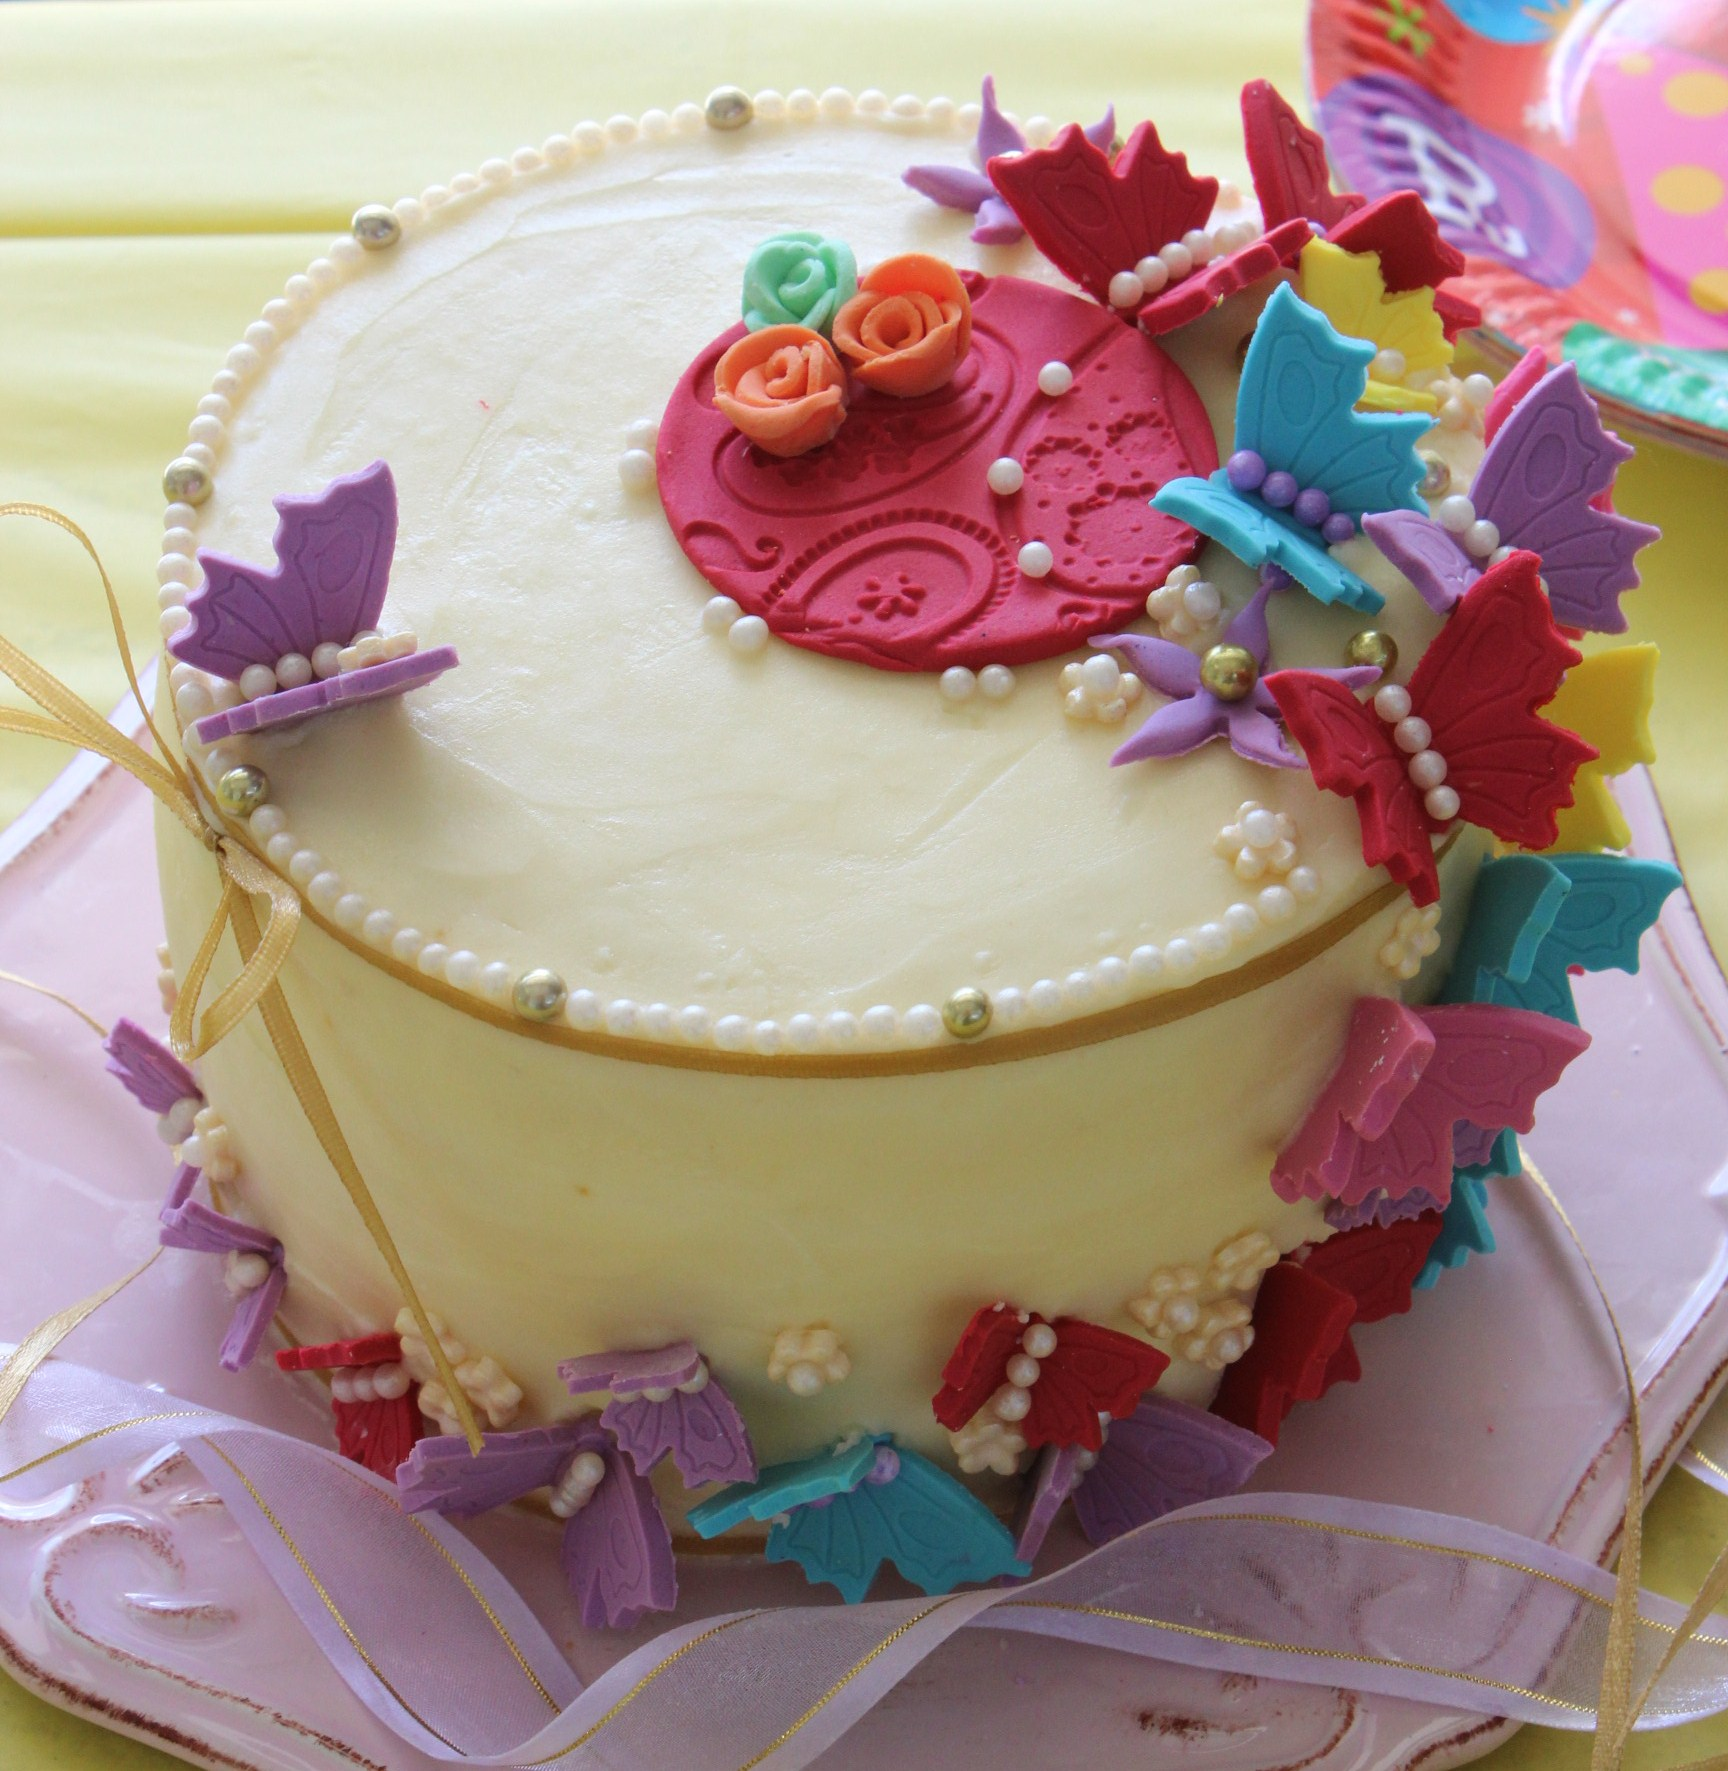 Birthday Cakes Gorgeous Image Inspiration of Cake and Birthday